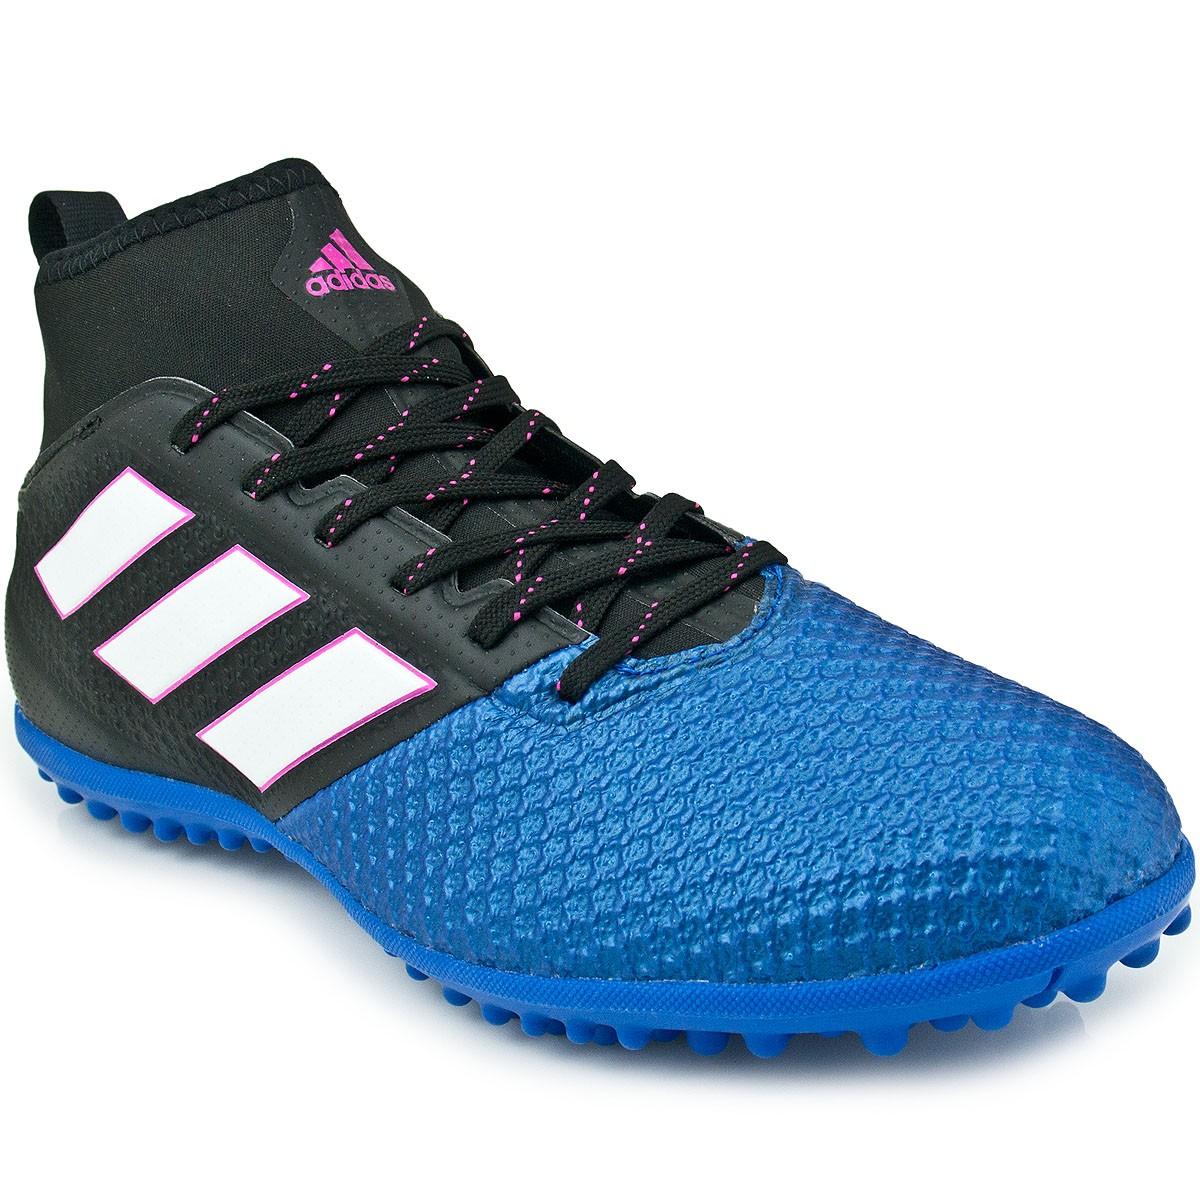 8f225a6e62 ... inexpensive shop chuteira adidas ace 17.3 primemesh tf f7cd3 da58a  97b87 2d524